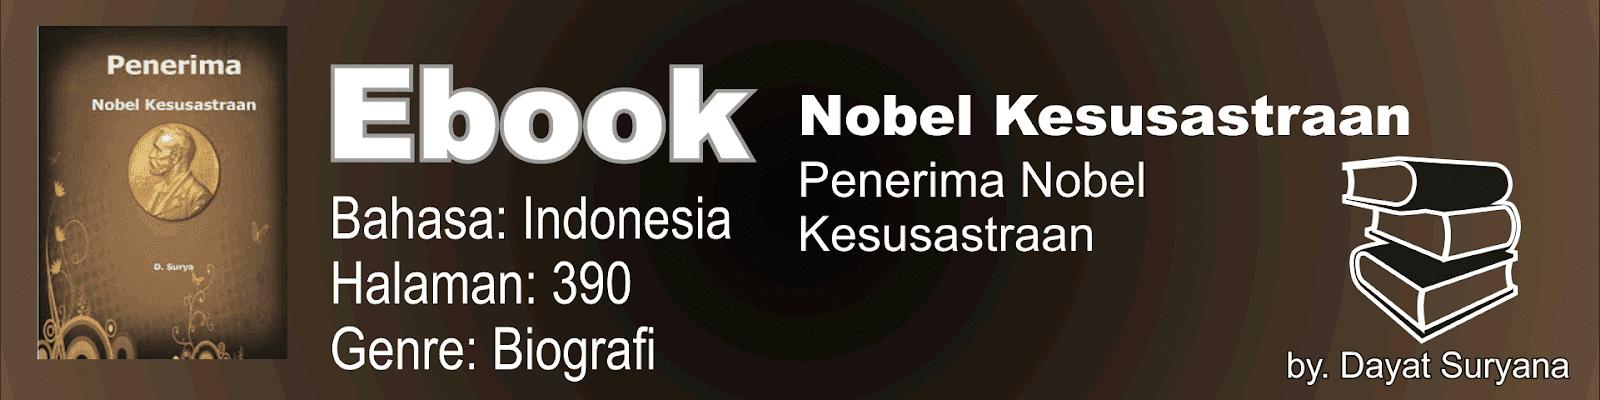 Buku Nobel Kesusastraan